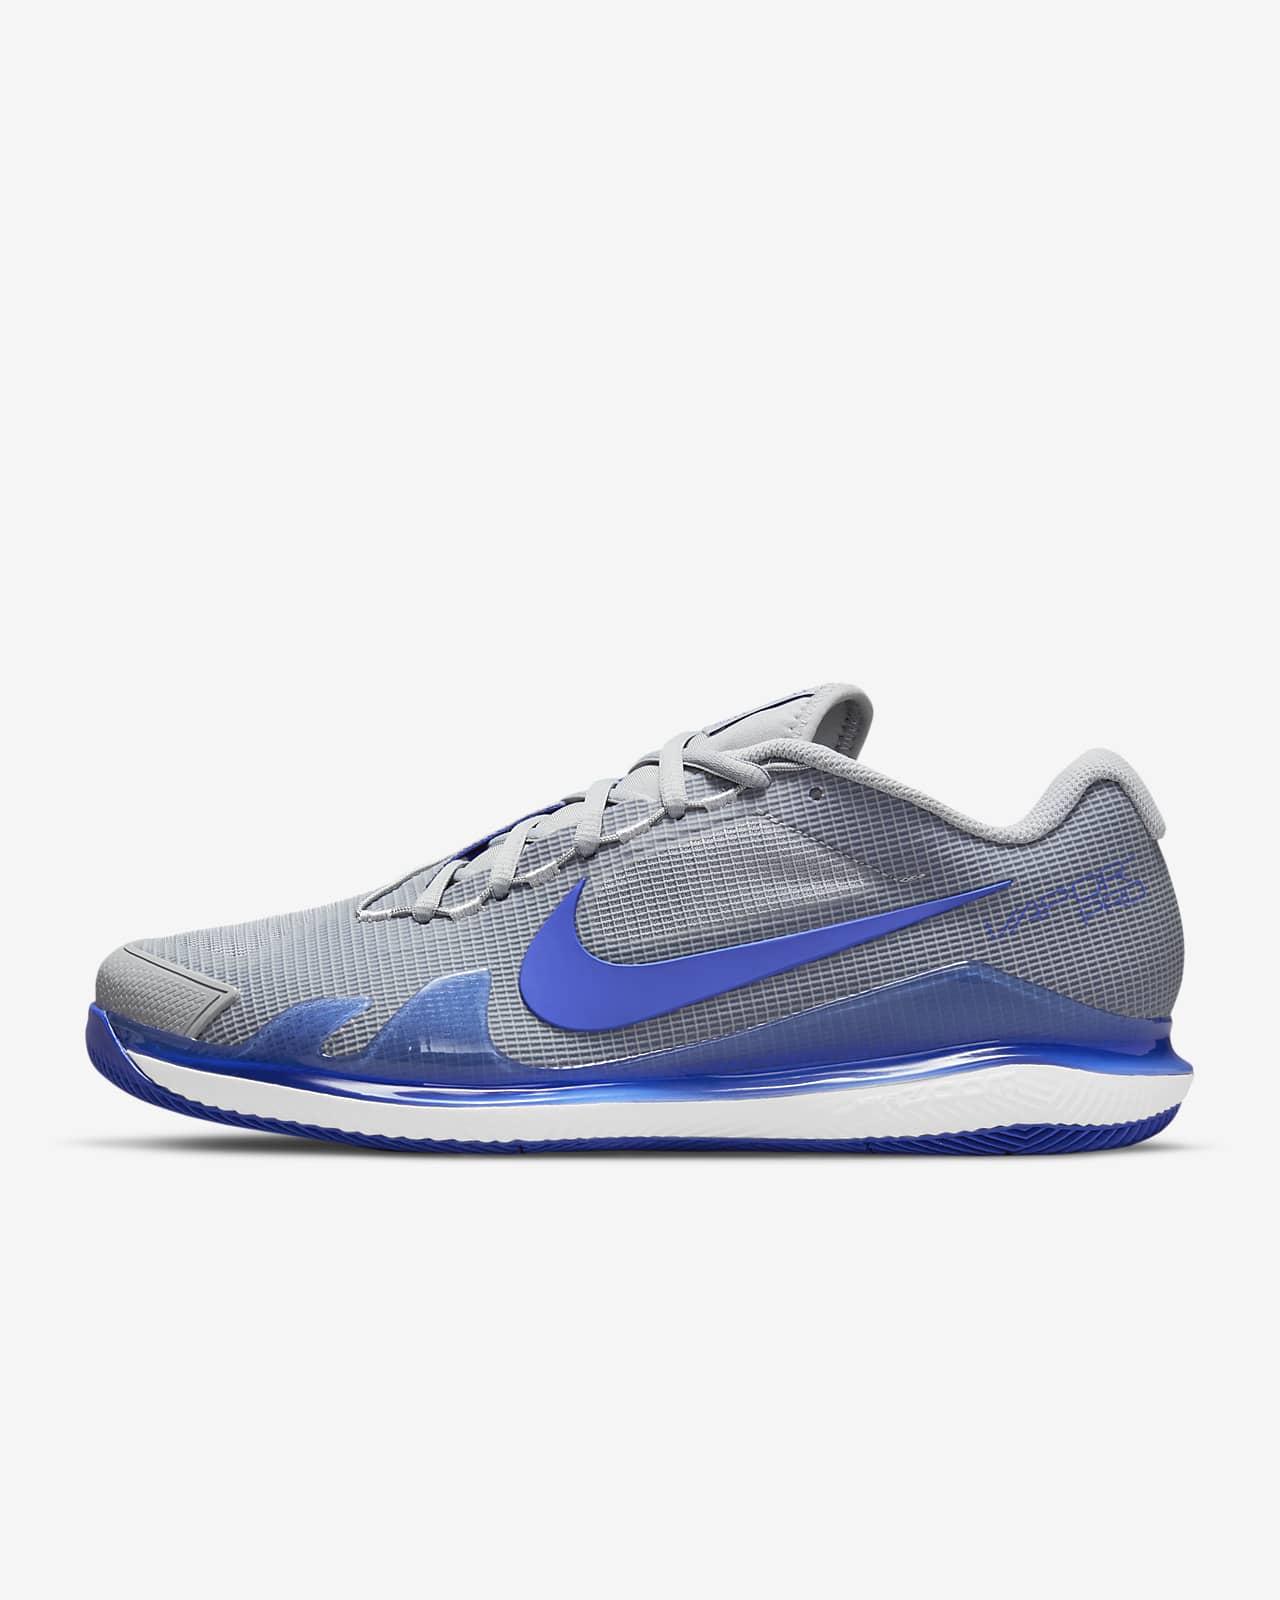 NikeCourt Air Zoom Vapor Pro Men's Hard-Court Tennis Shoe